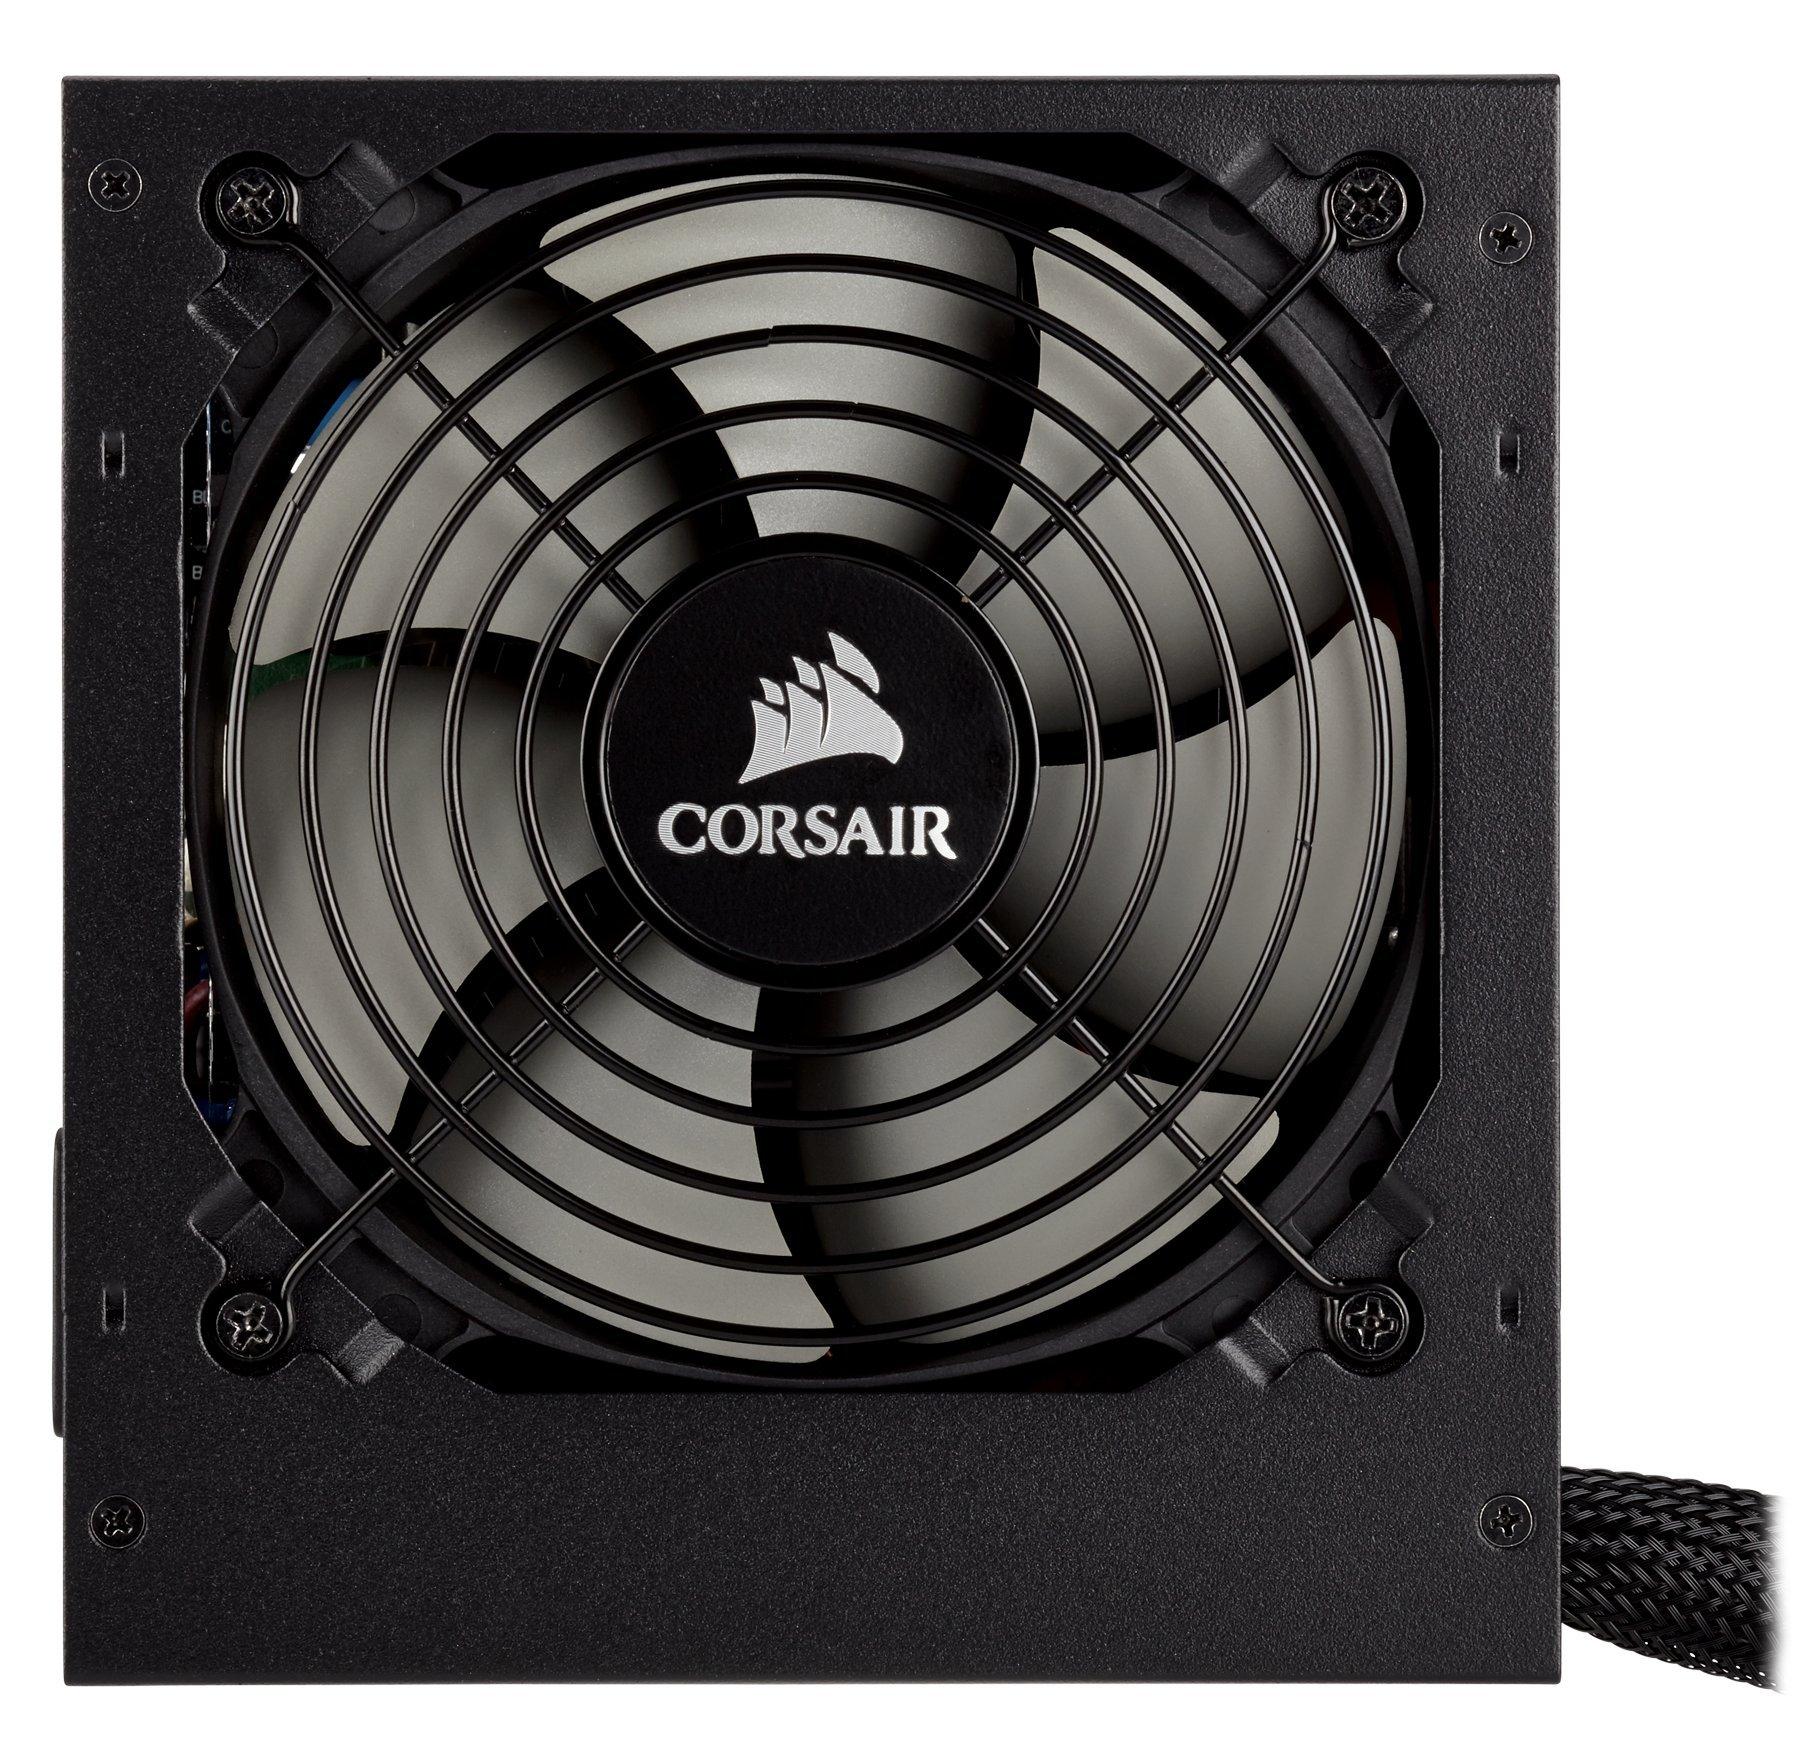 CORSAIR TXM Series, TX550M, 550 Watt, 80+ Gold Certified, Semi Modular Power Supply by Corsair (Image #5)